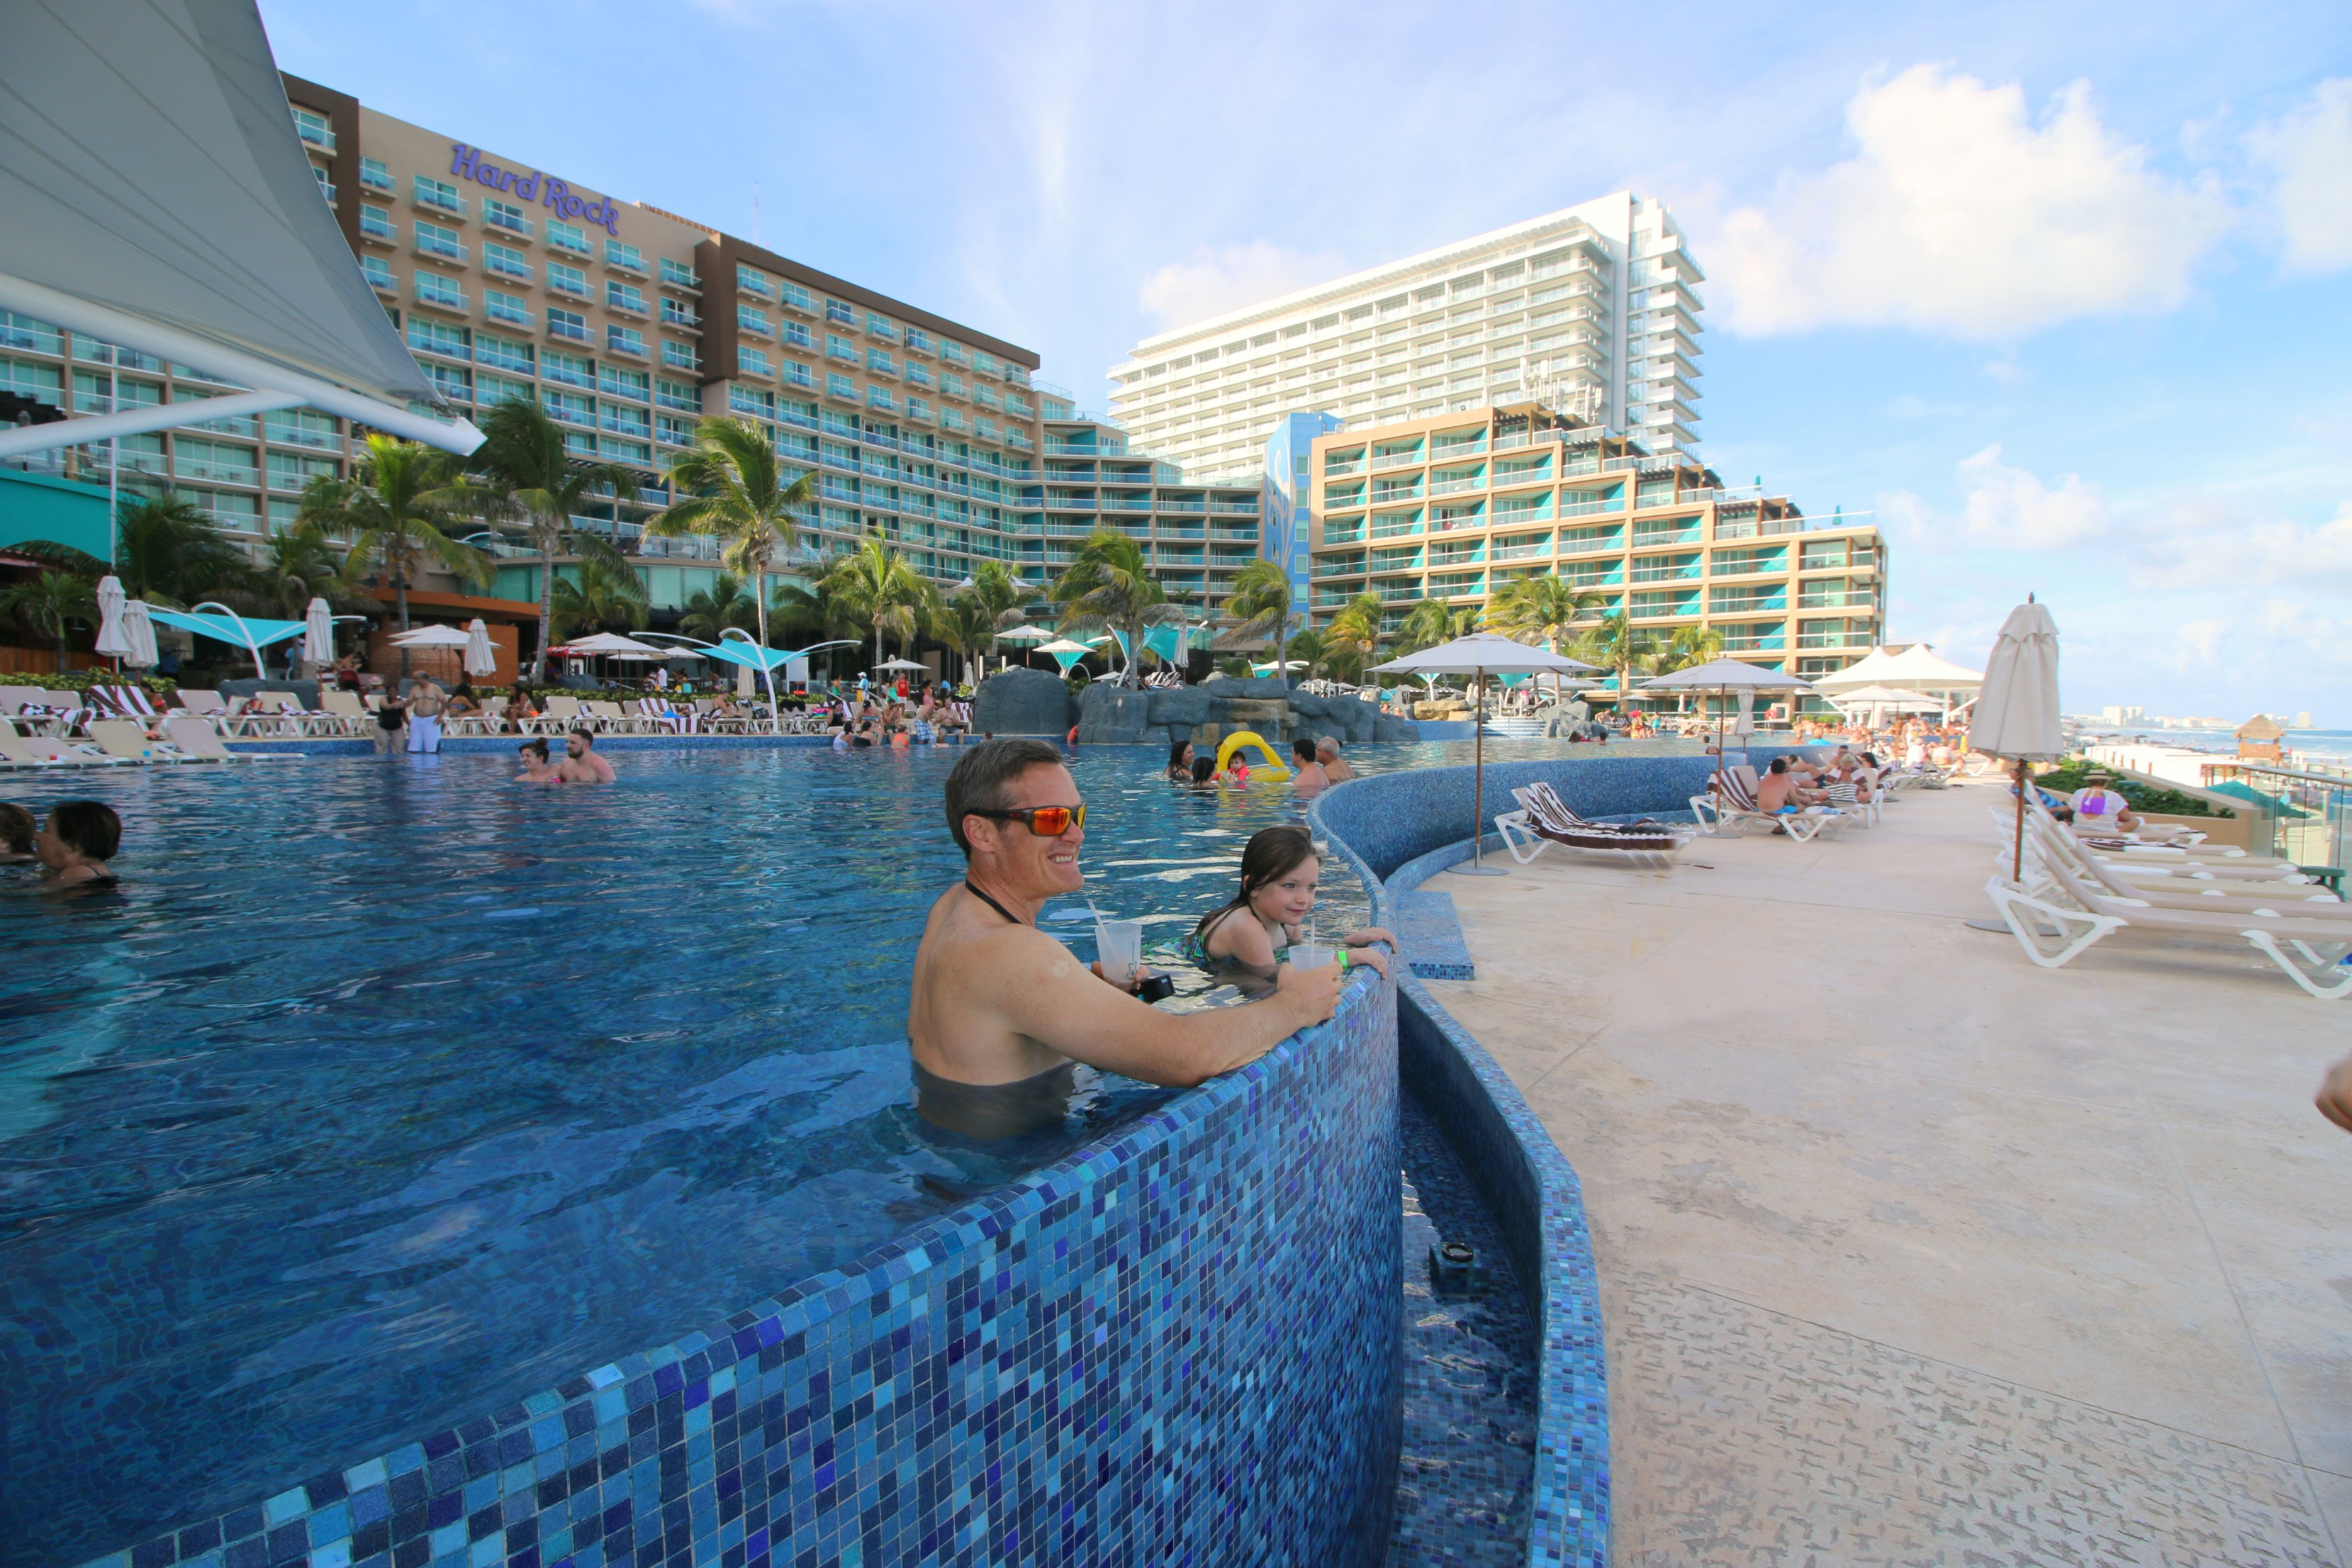 hard-rock-cancun-pools-for-kids